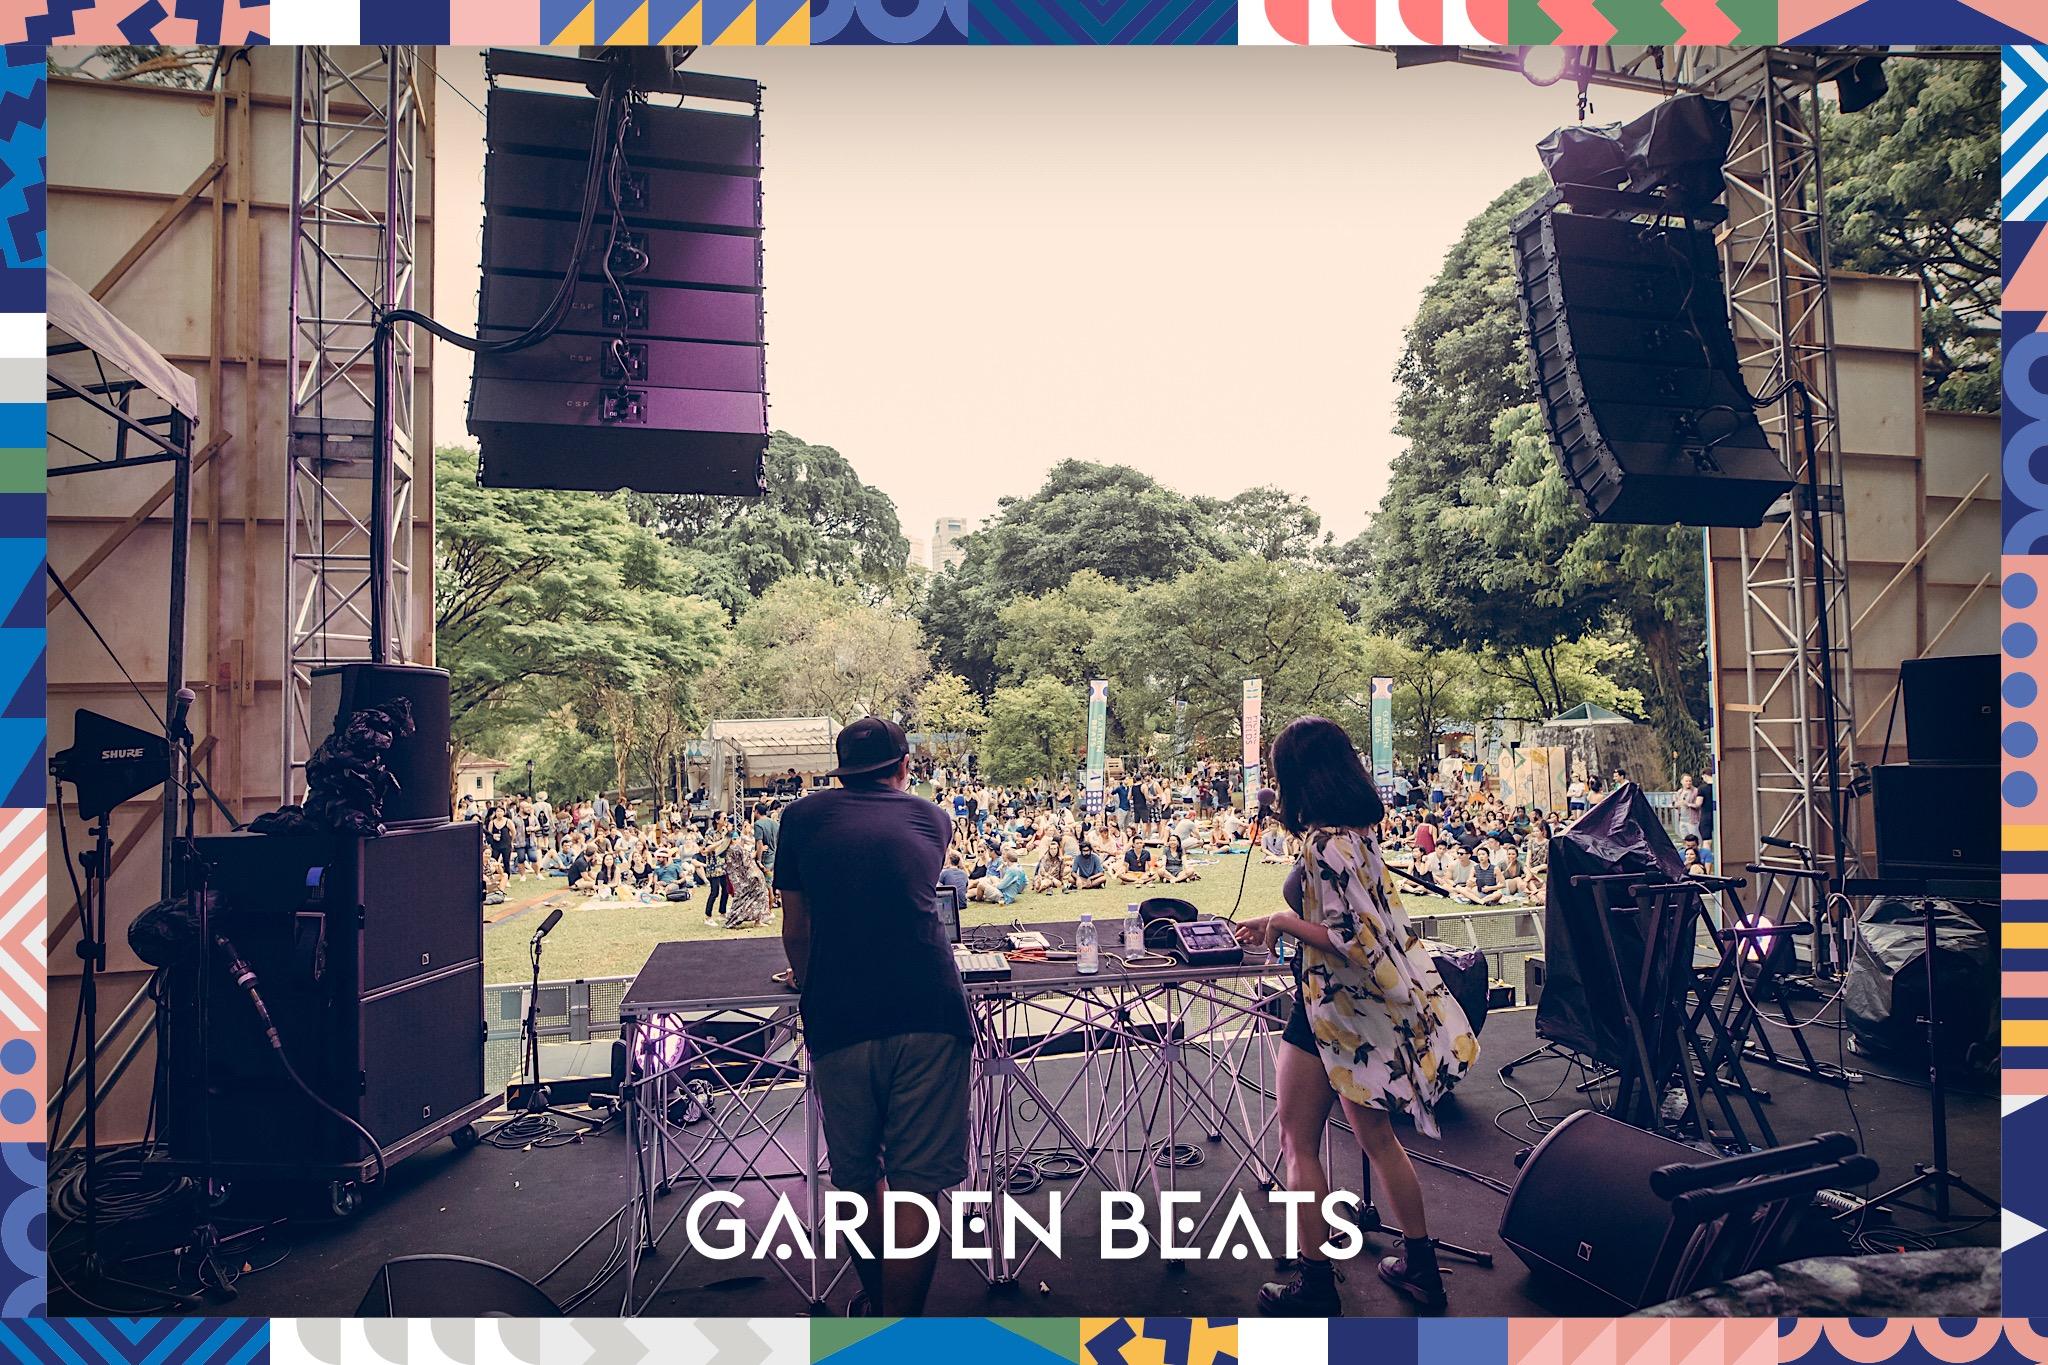 03032018_GardenBeats_Colossal454_Watermarked.jpg